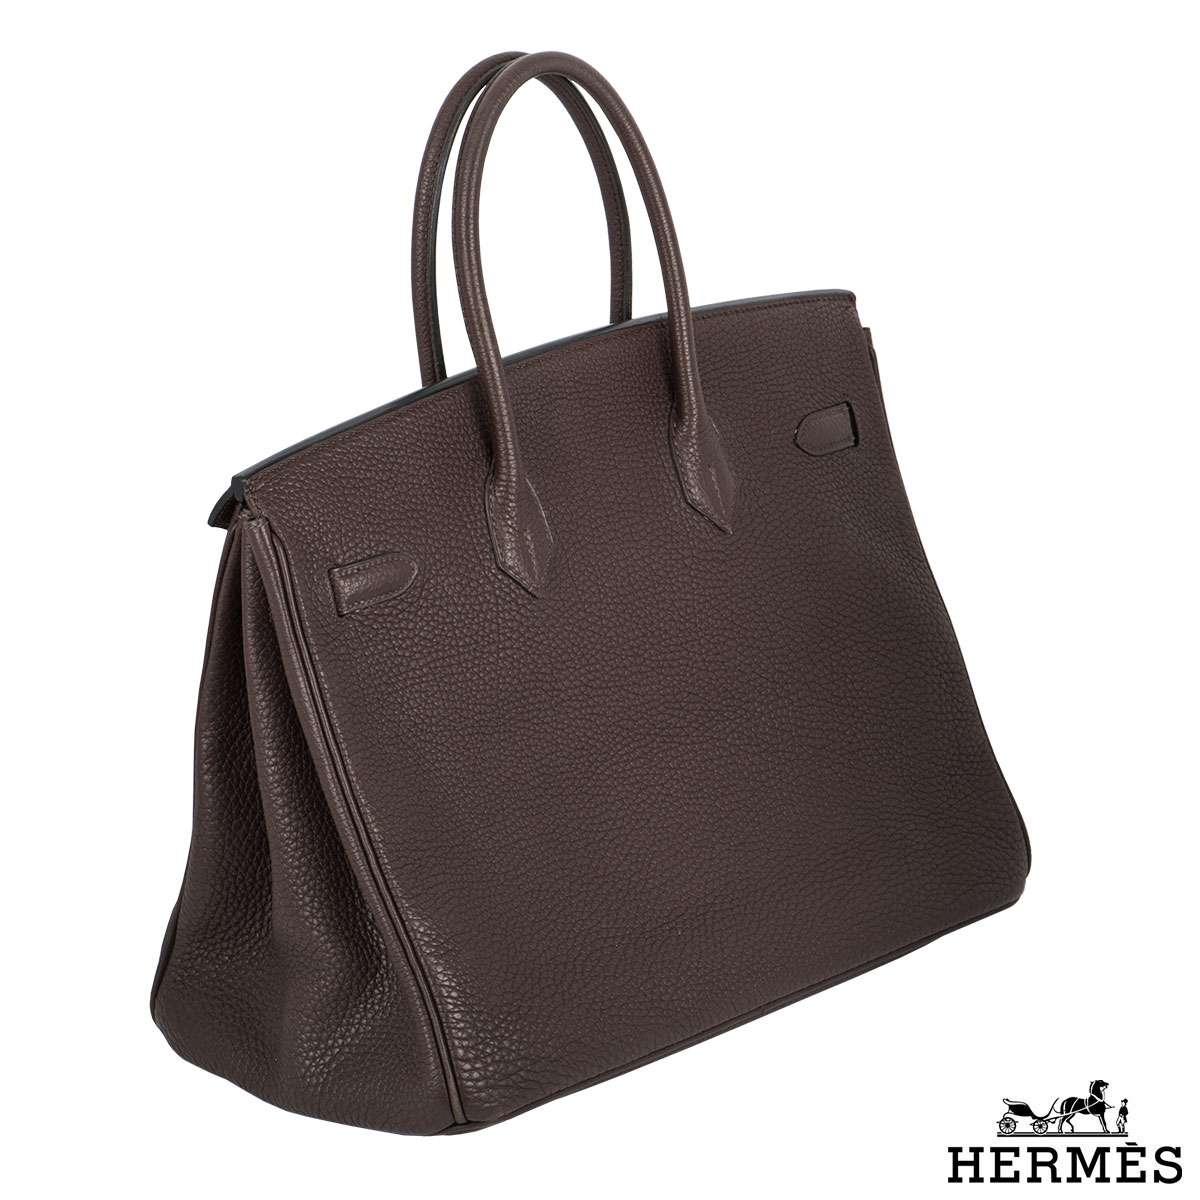 Hermès 35cm GHW Cacao Birkin Bag